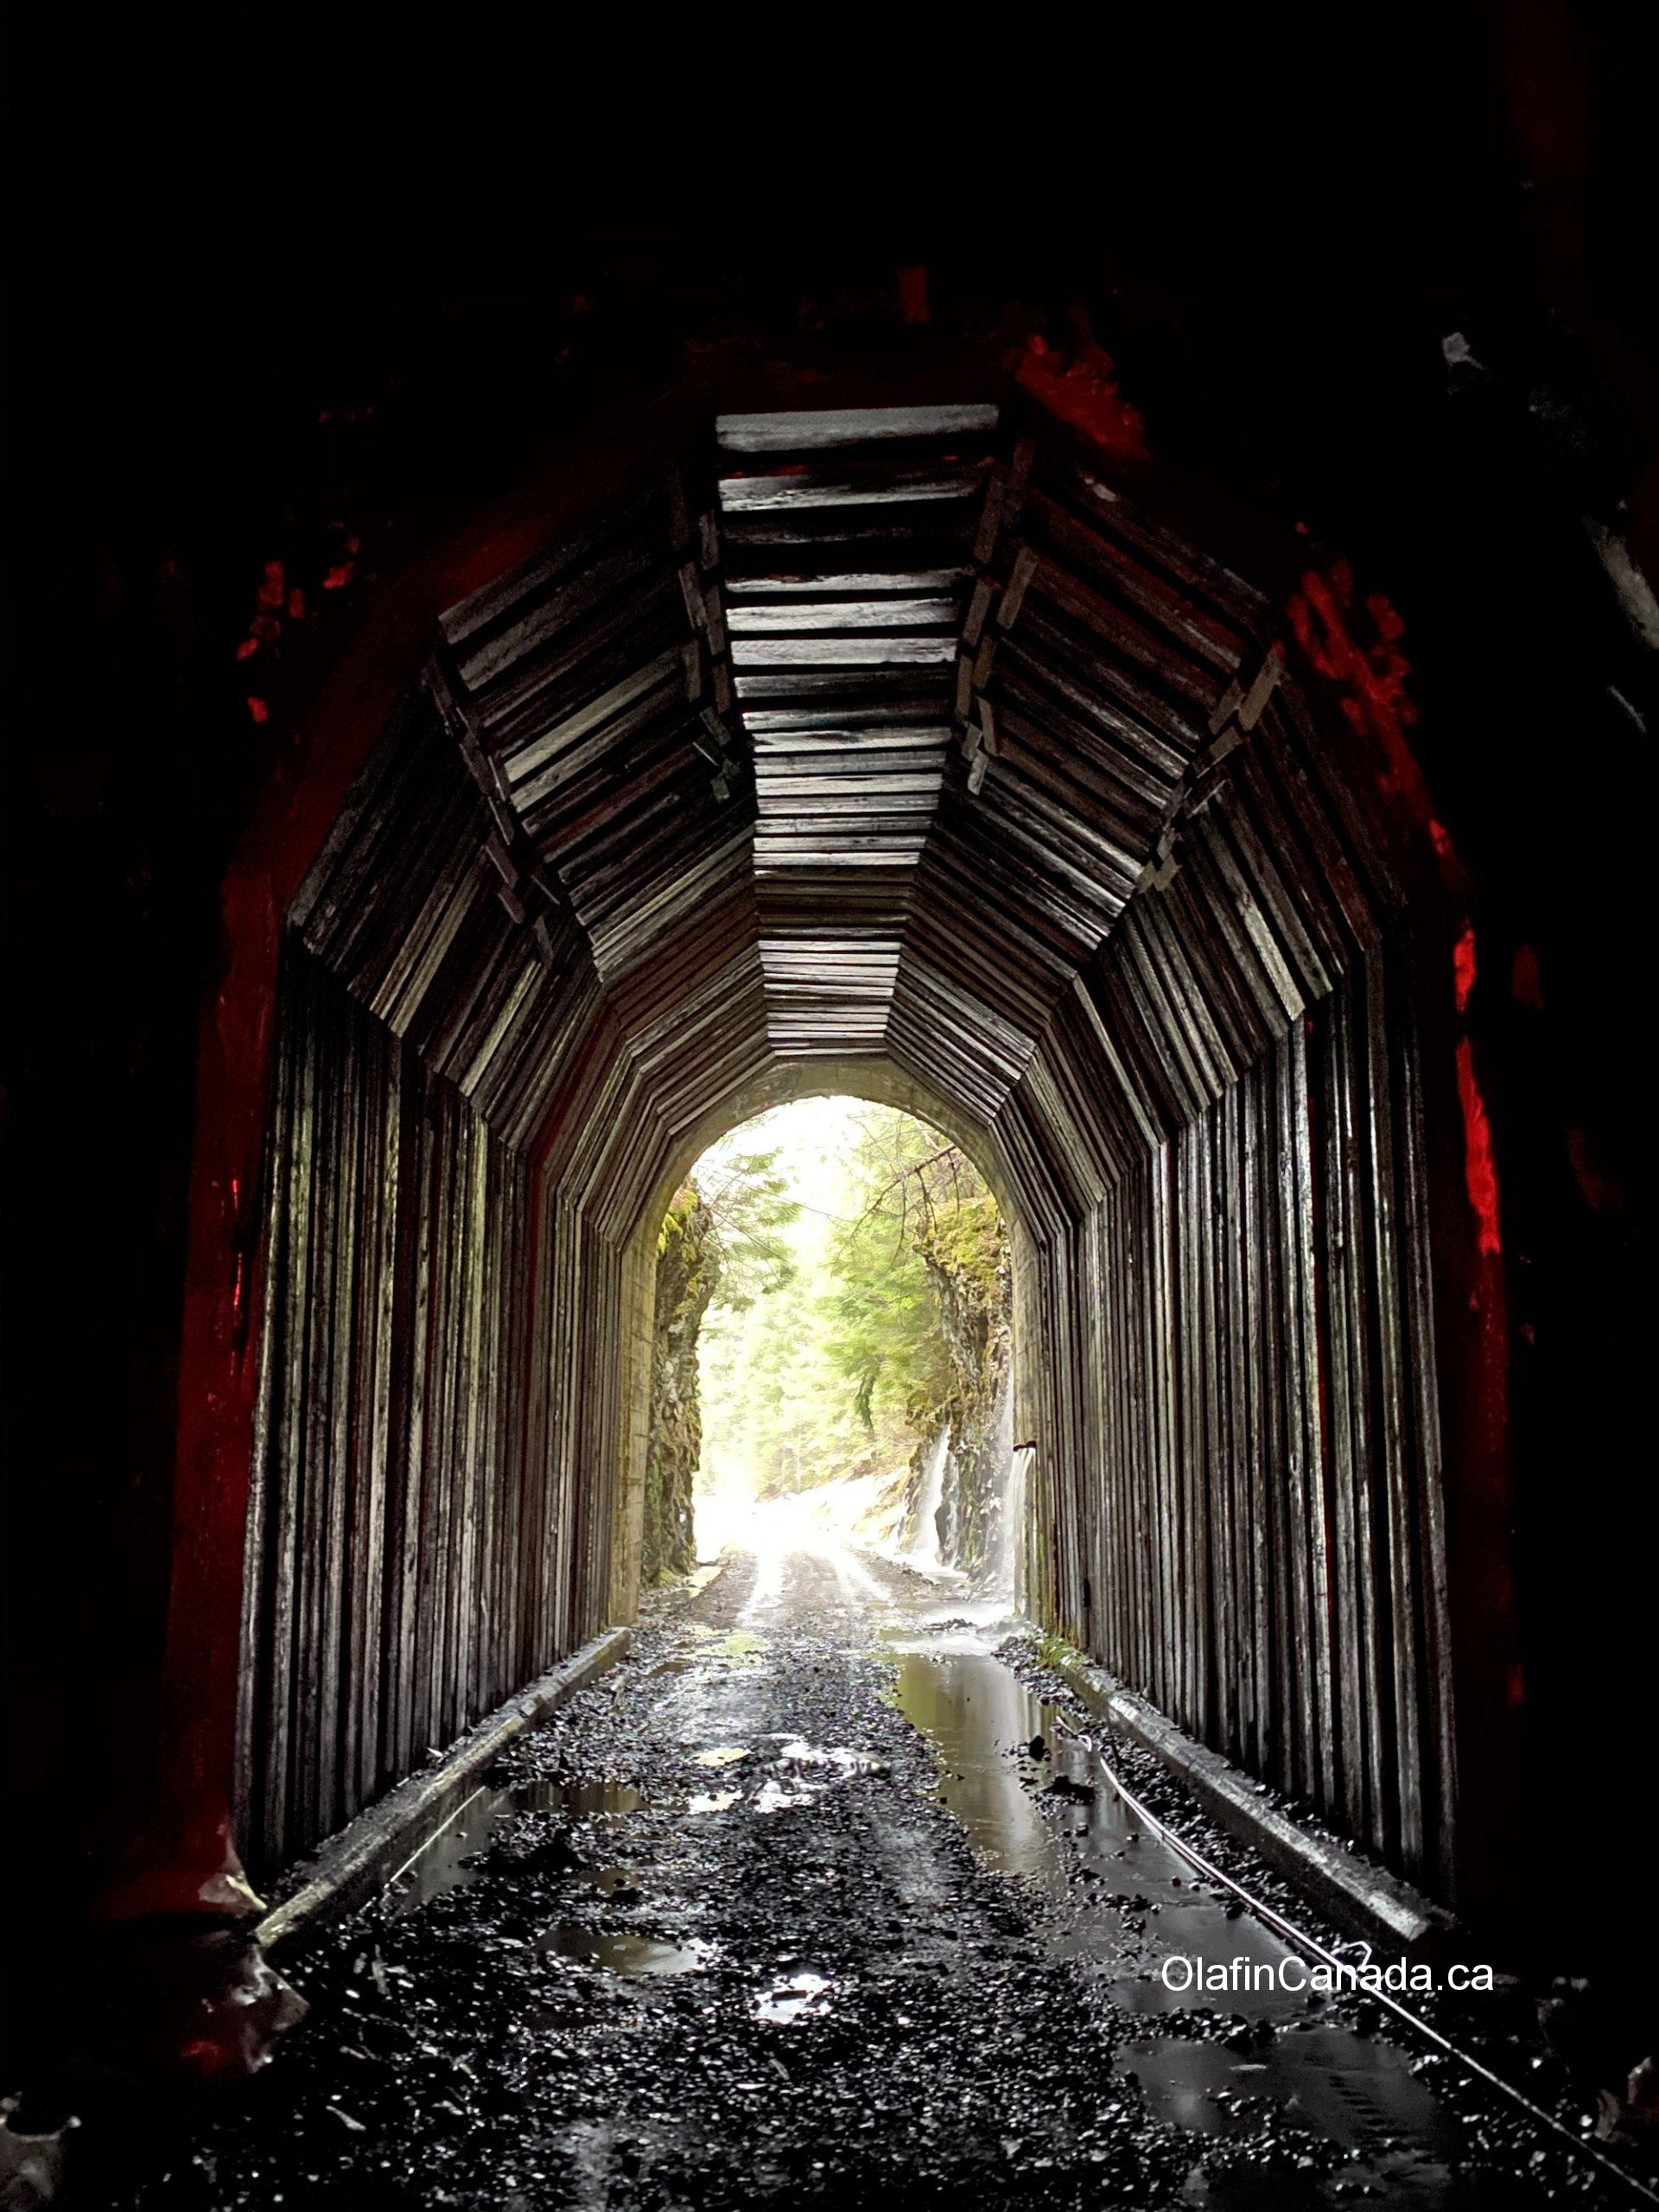 Bulldog Tunnel (912 meters long) on the Columbia Western Railway in the Kootenays #bulldogtunnel #kootenays #abandonedbc